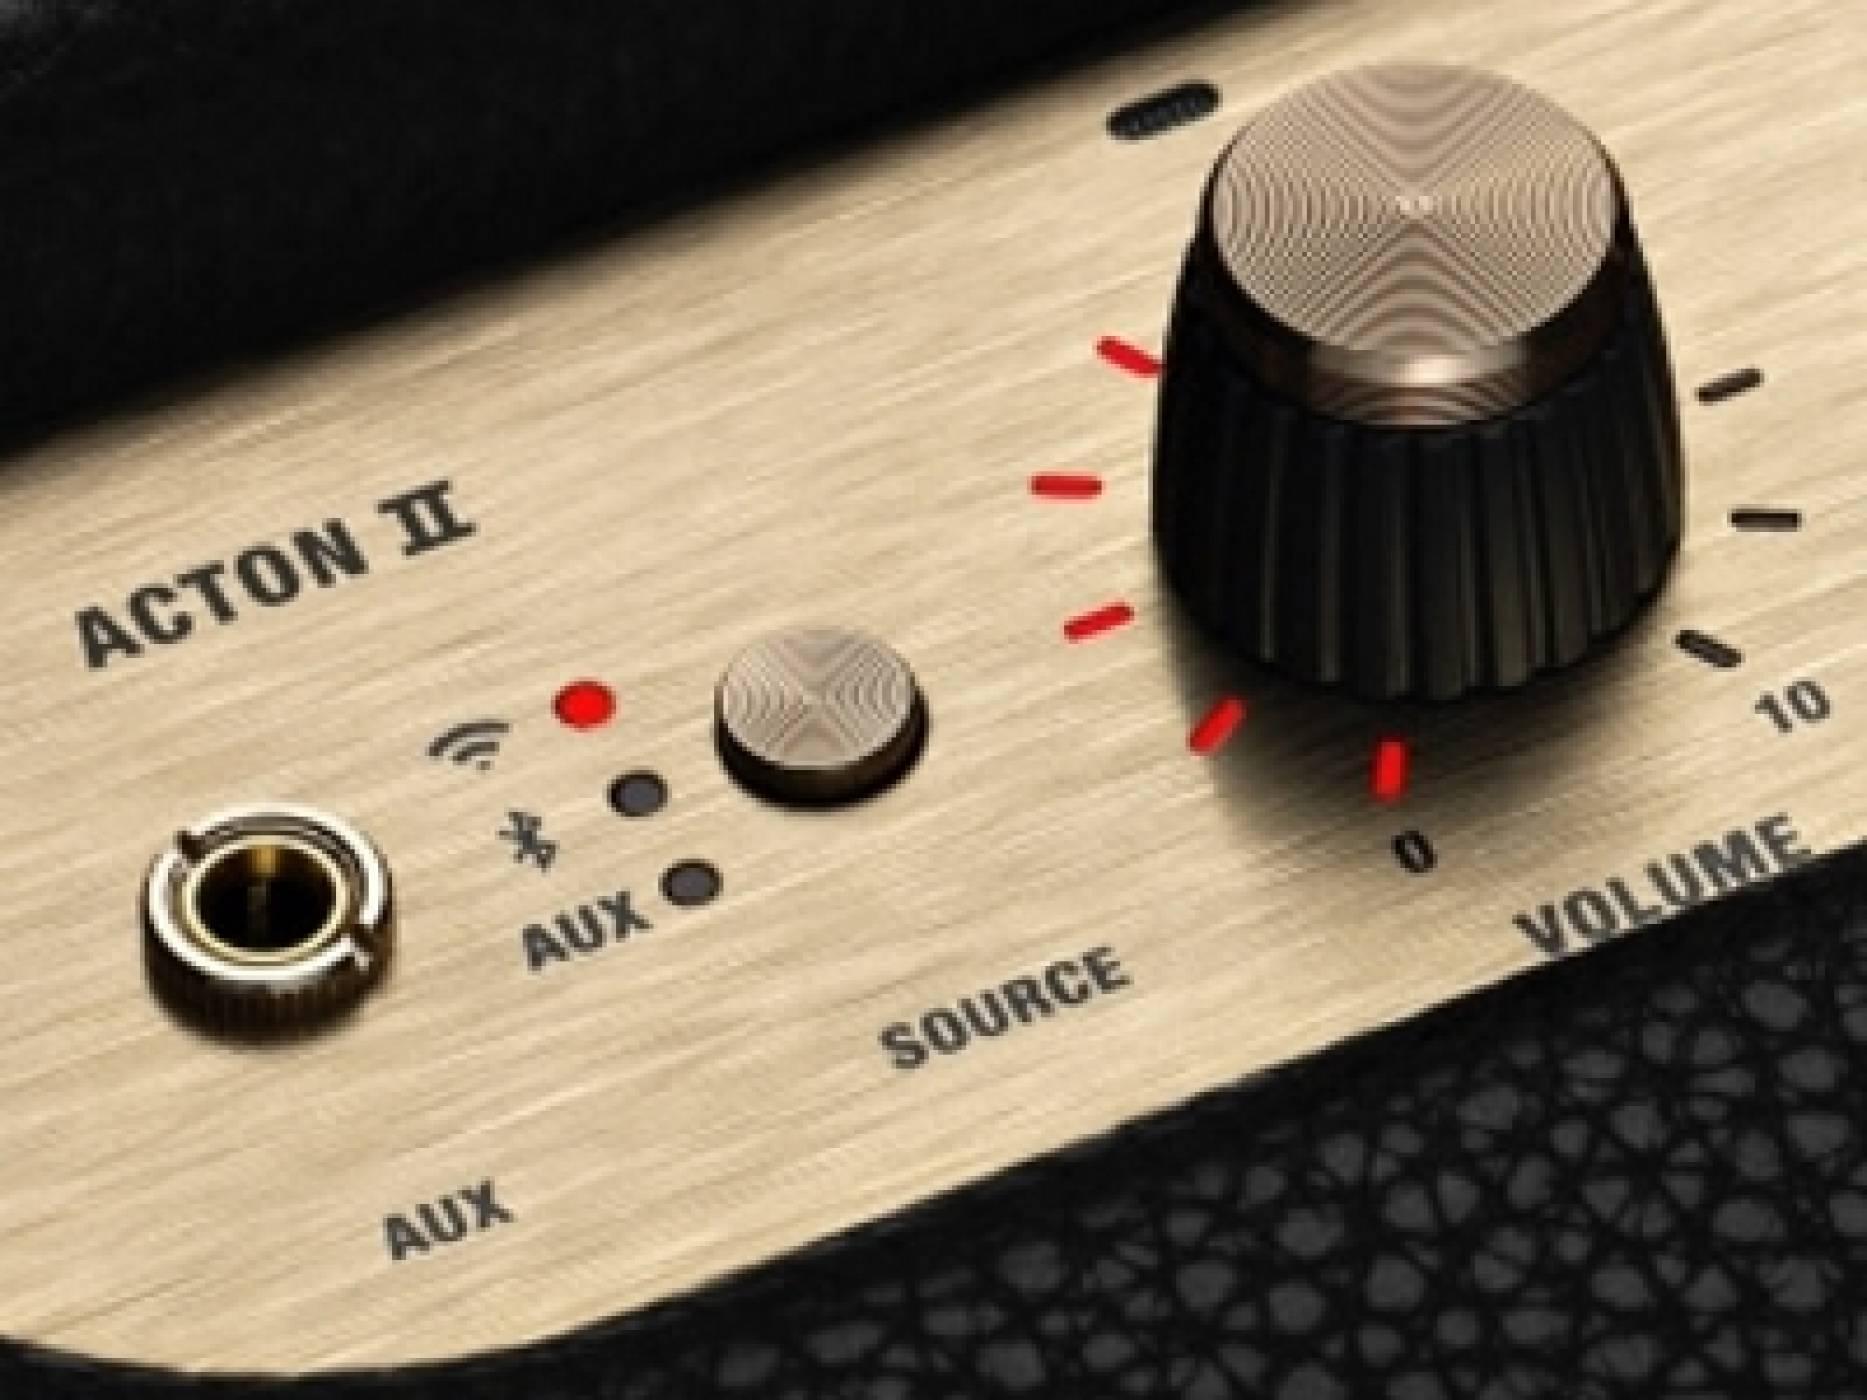 Marshall Action II Voice прилича на китарен усилвател и работи с Amazon Alexa